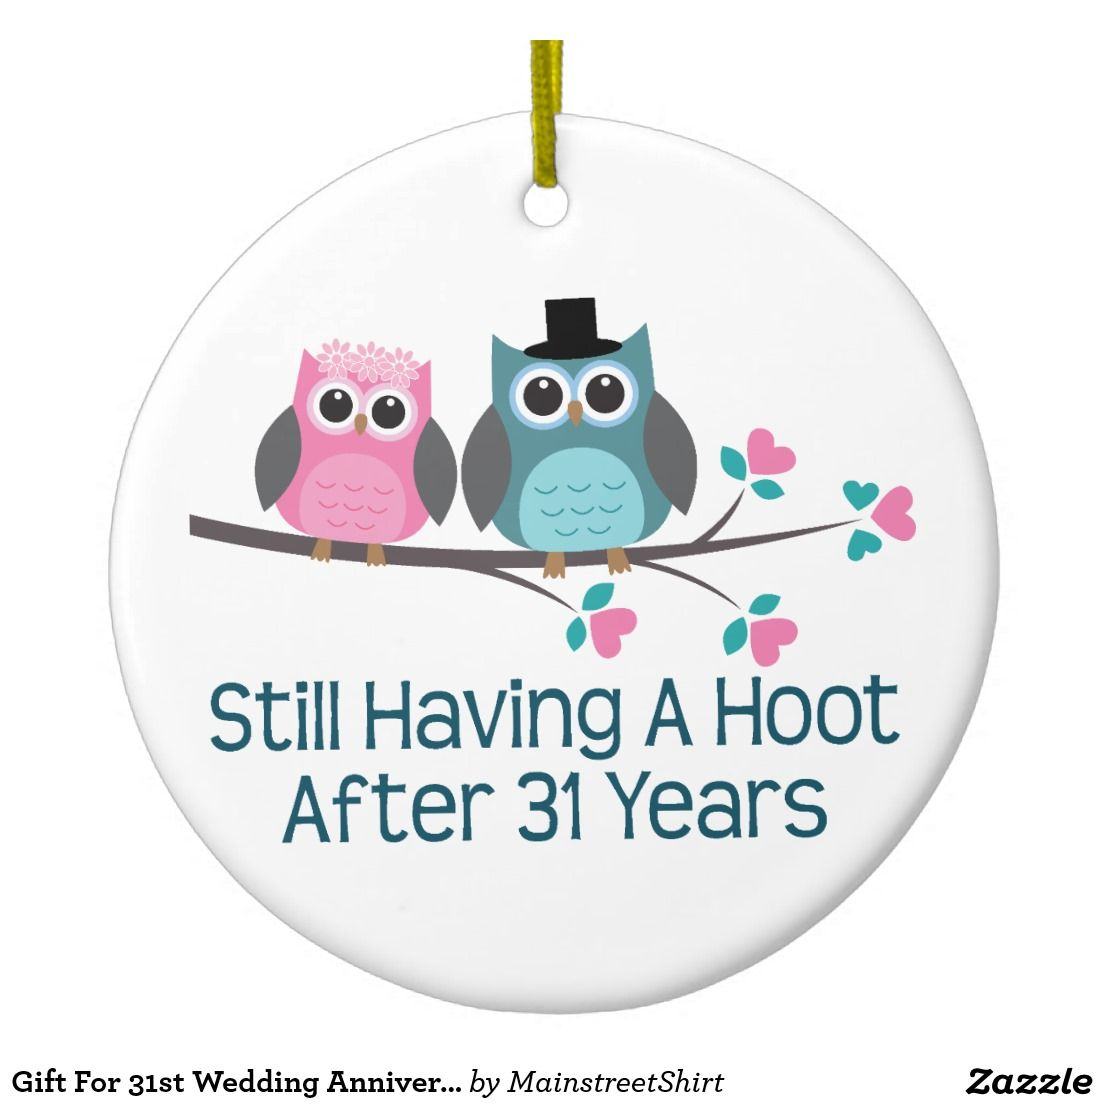 Gift For 31st Wedding Anniversary Hoot Christmas Ornament